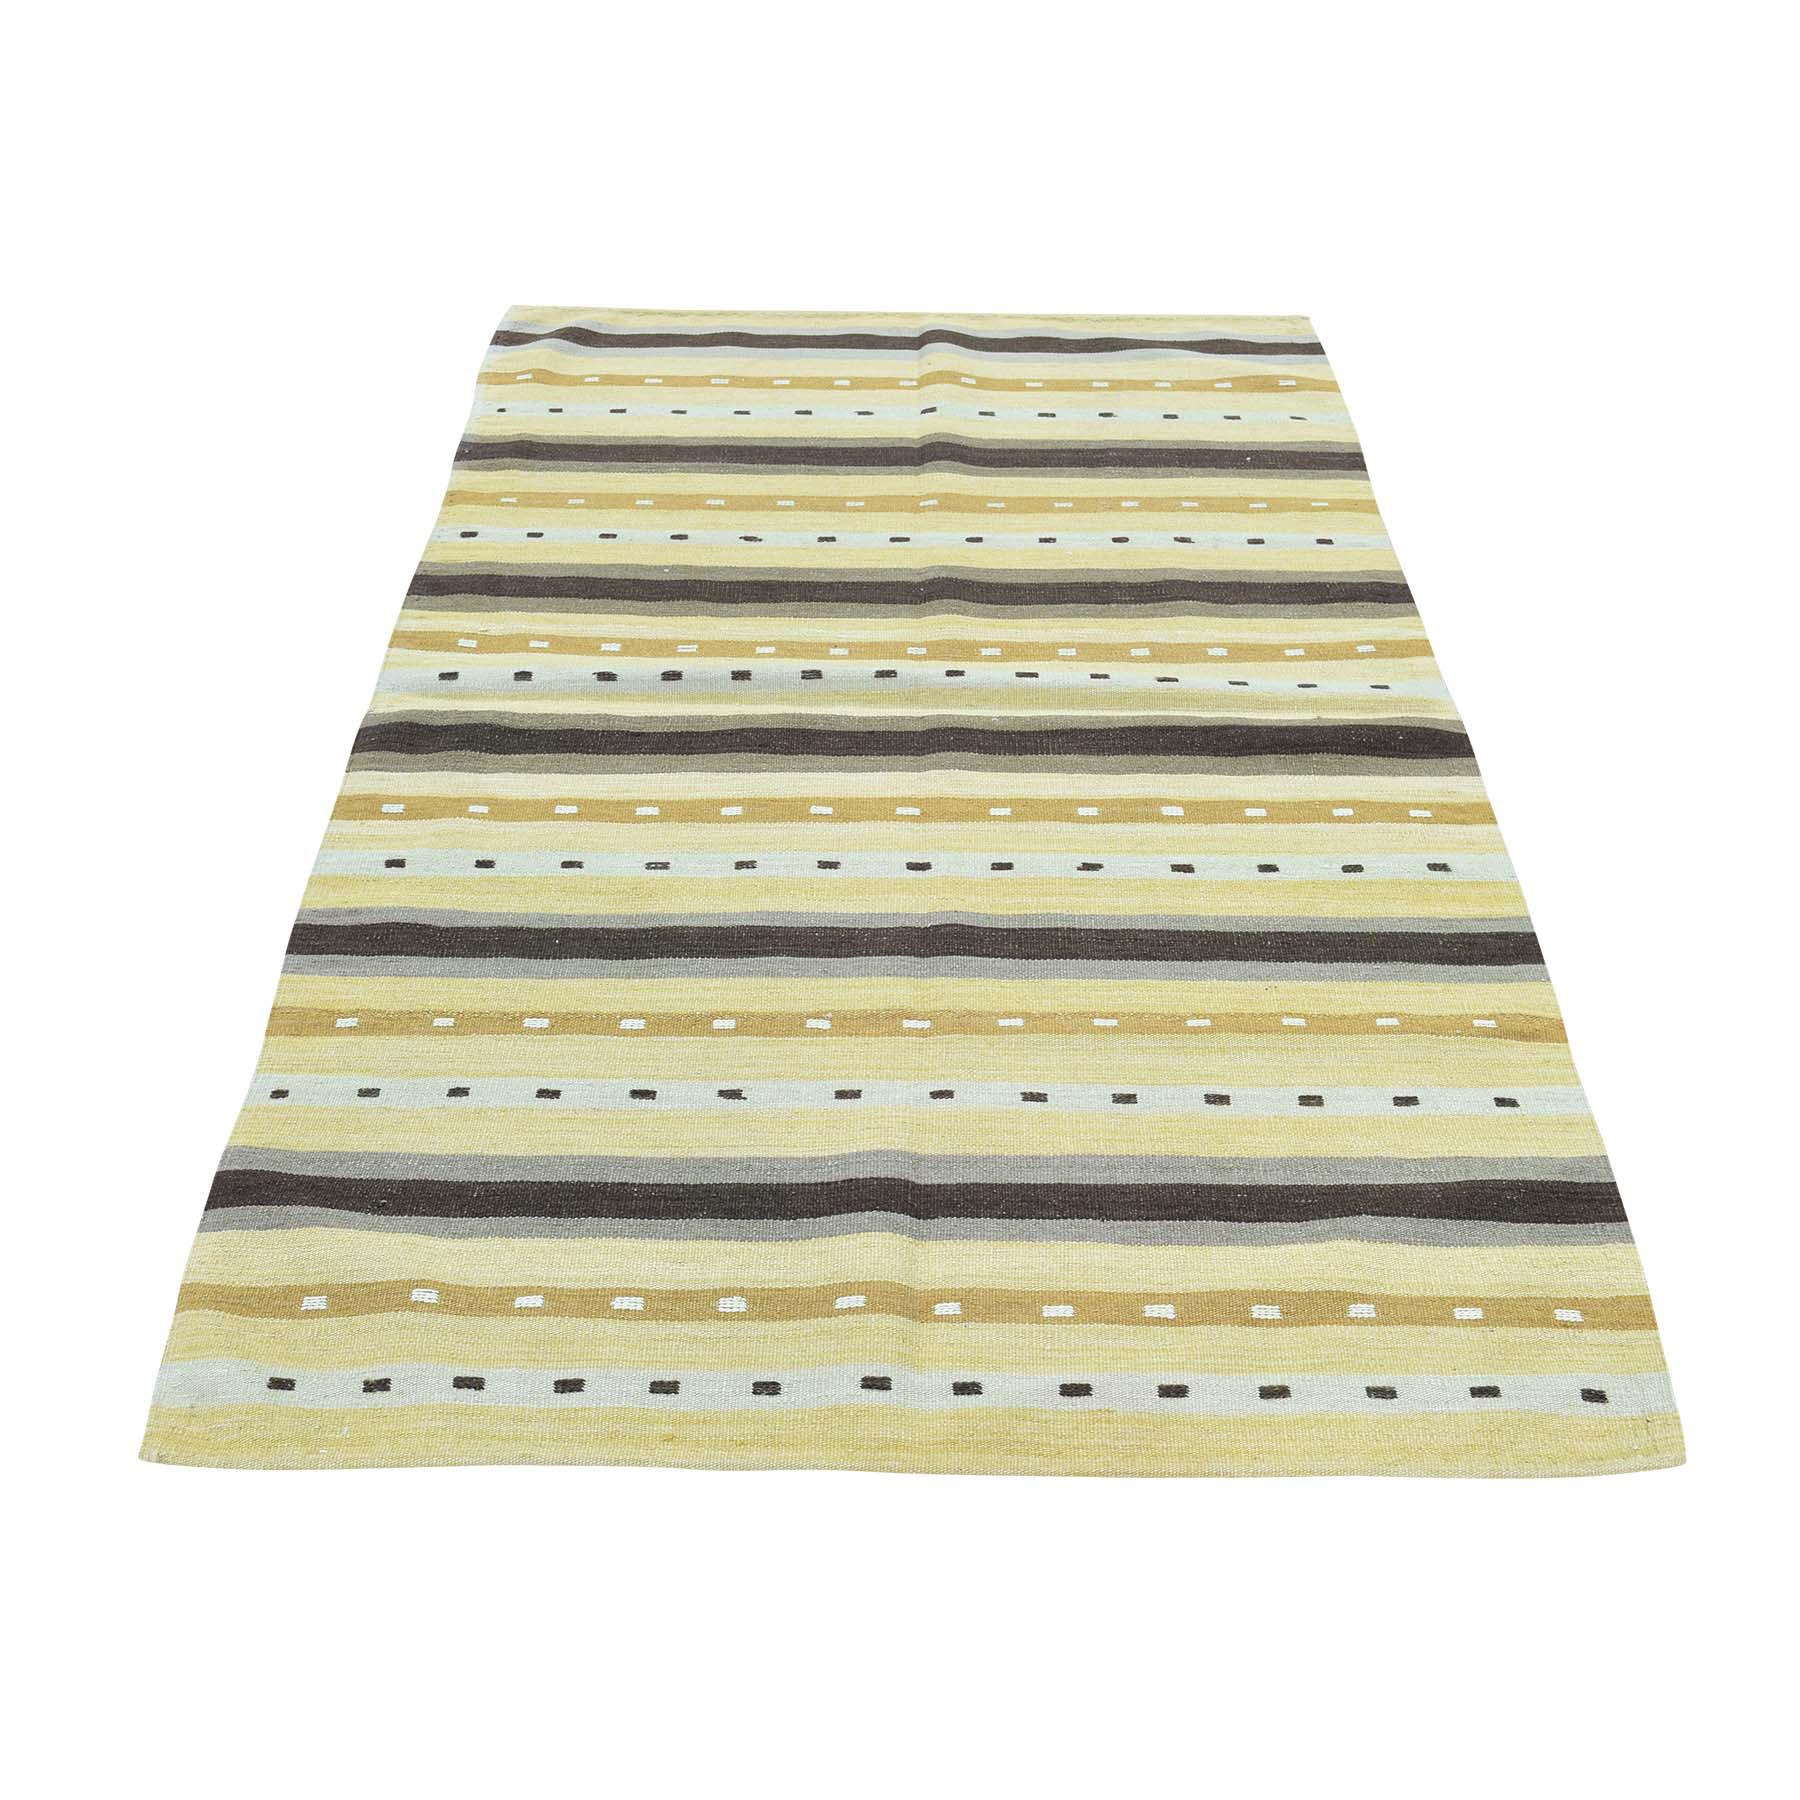 "3'1""X5'2"" Flat Weave Hand-Woven Reversible Striped Qashqai Kilim Rug moaca8e8"